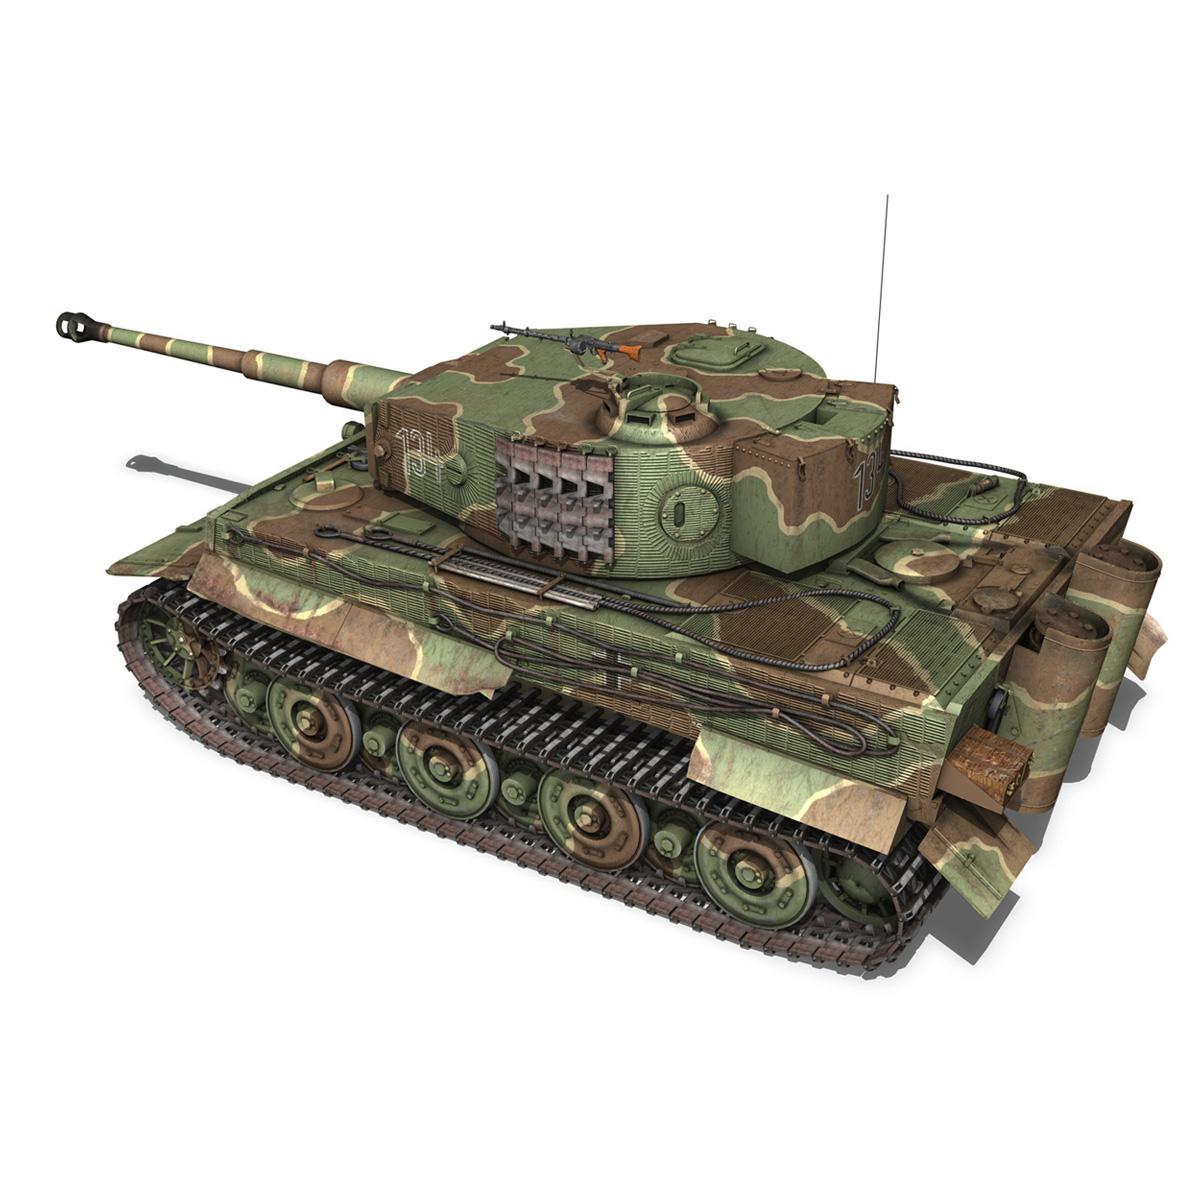 panzer vi tiger 134 late production 3d model buy panzer vi tiger 134 late. Black Bedroom Furniture Sets. Home Design Ideas